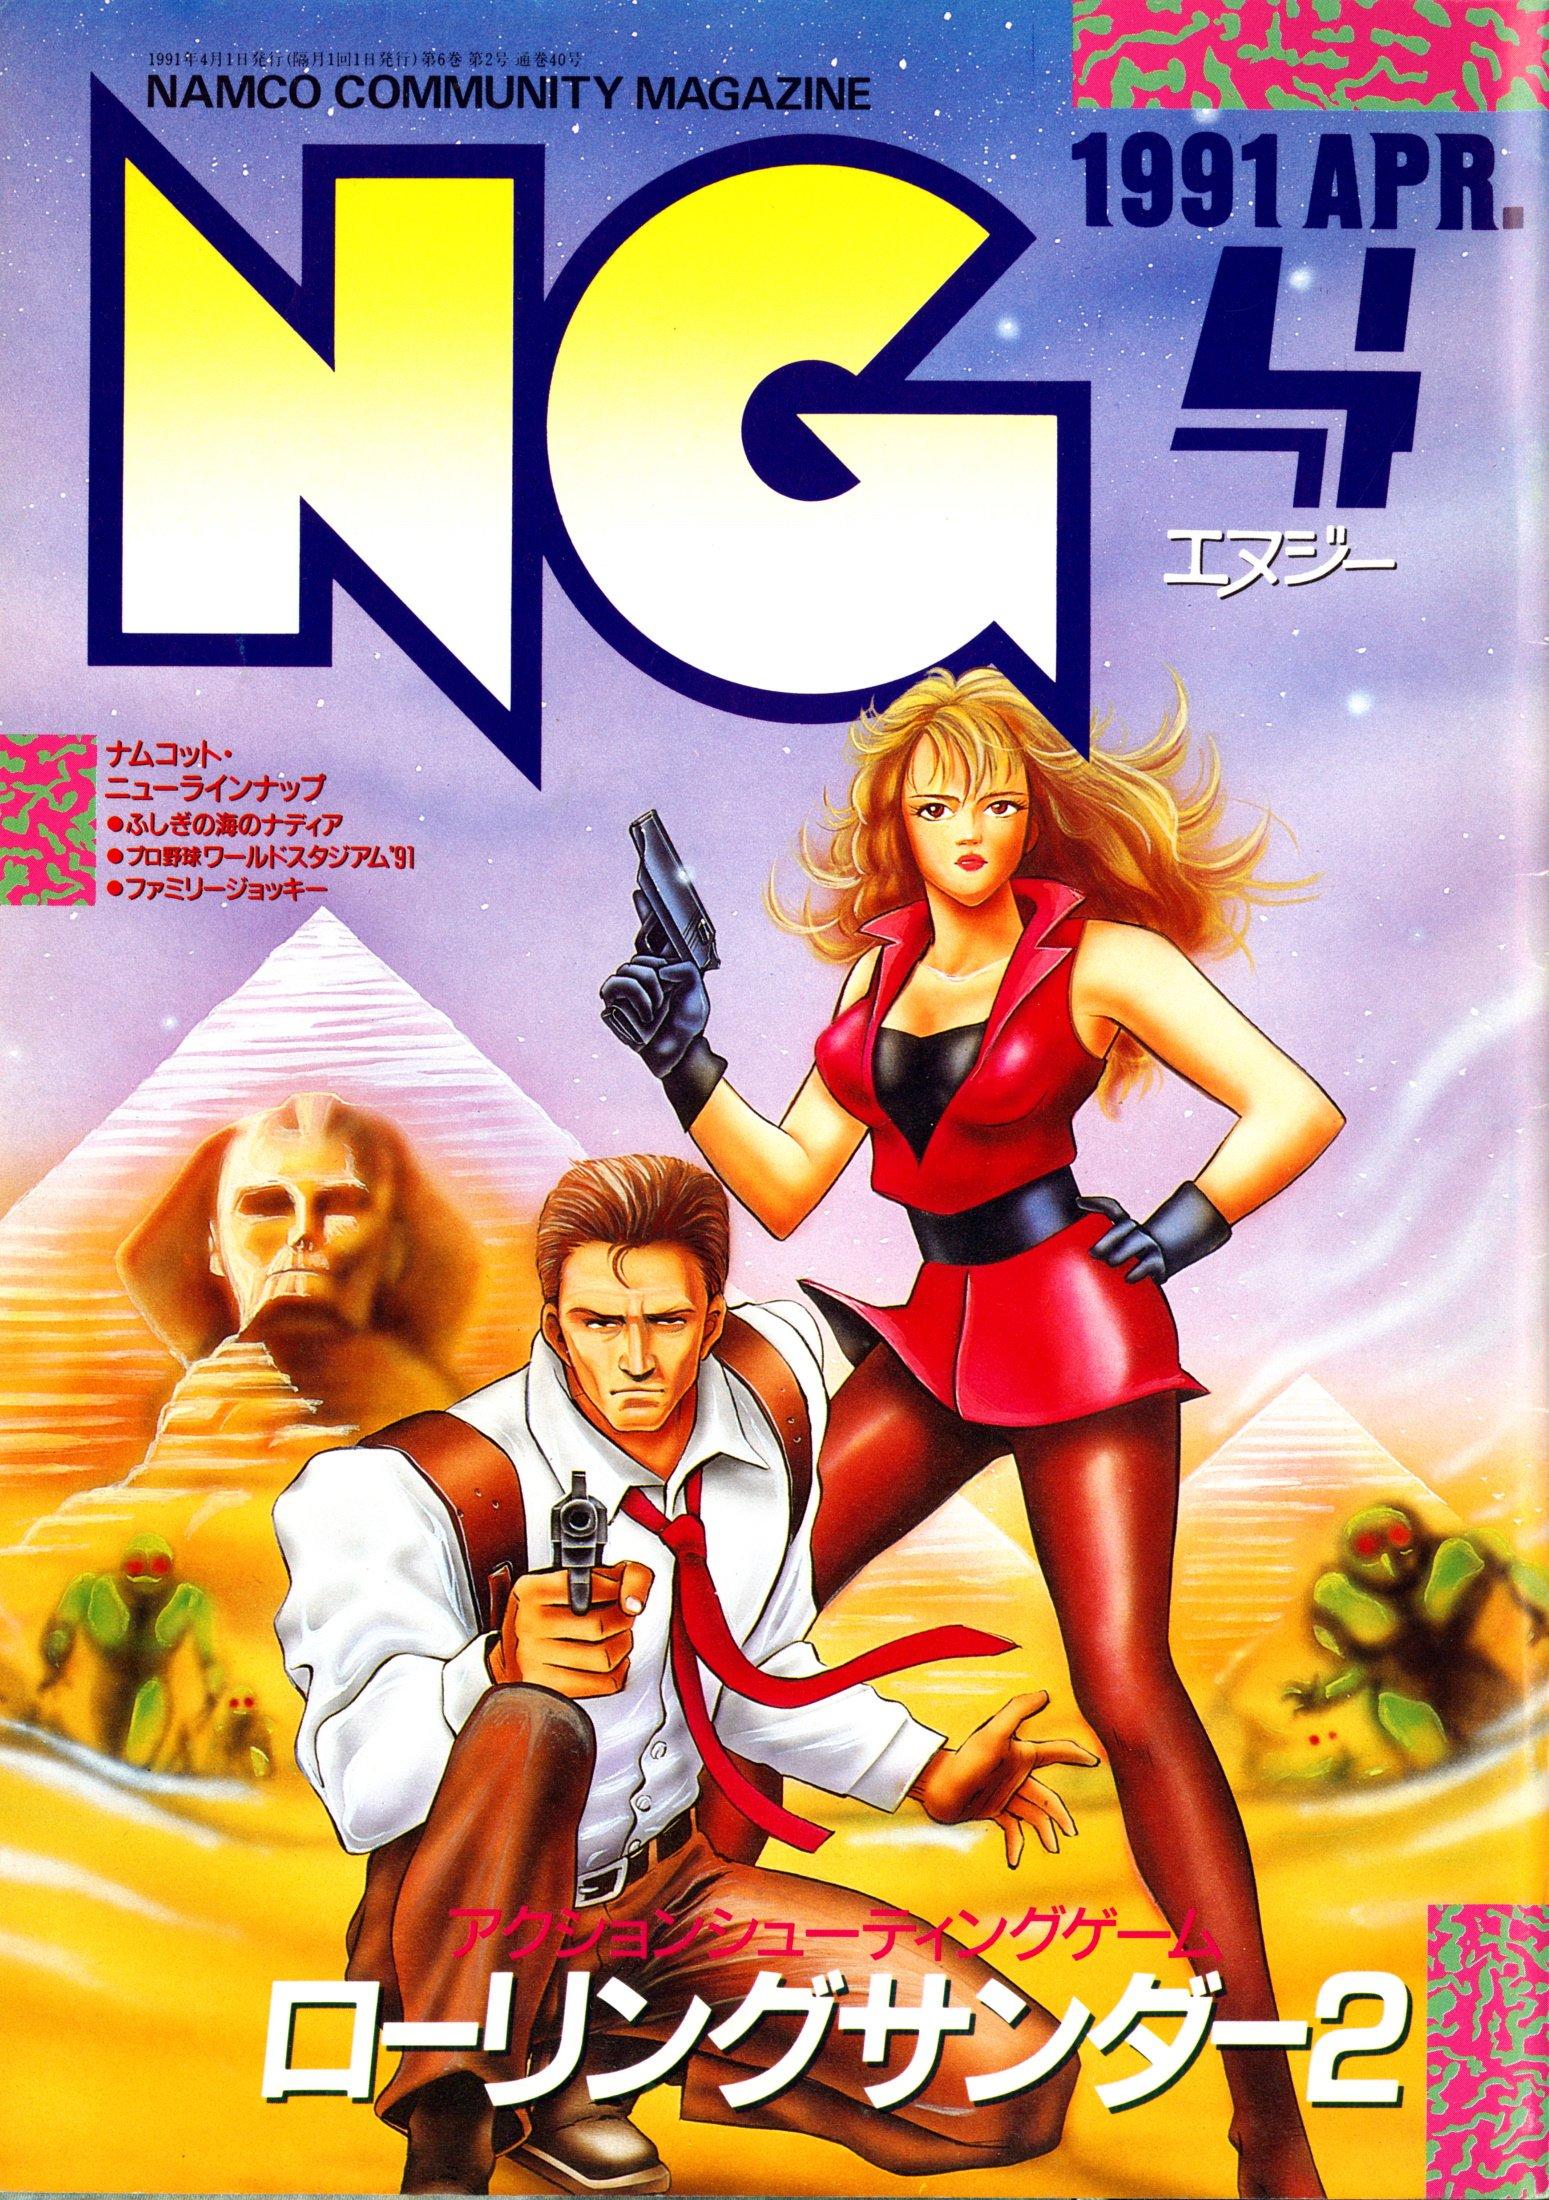 NG Namco Community Magazine Issue 40 (April 1991)